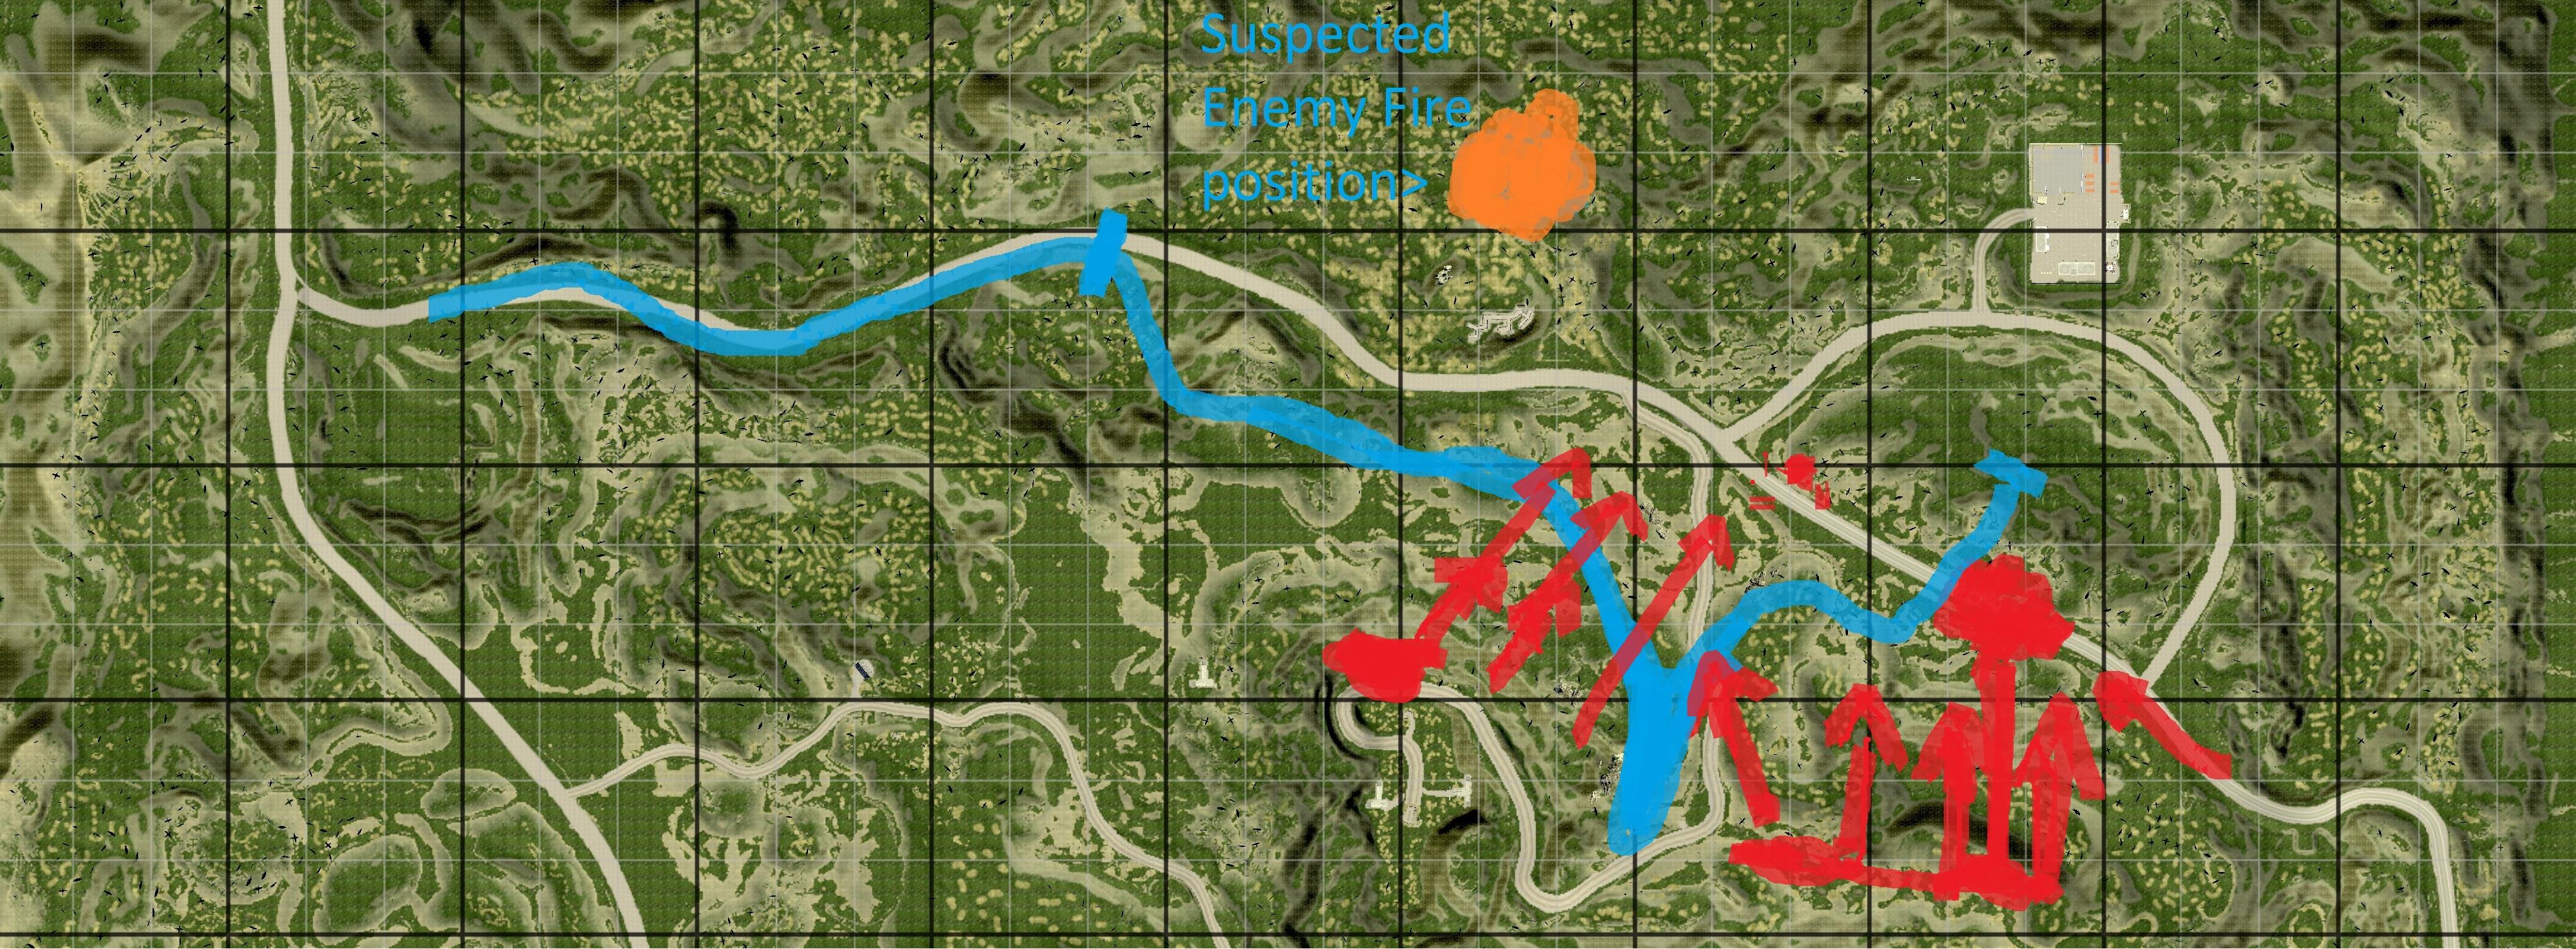 Fools_Road_v1_Minimap.jpg